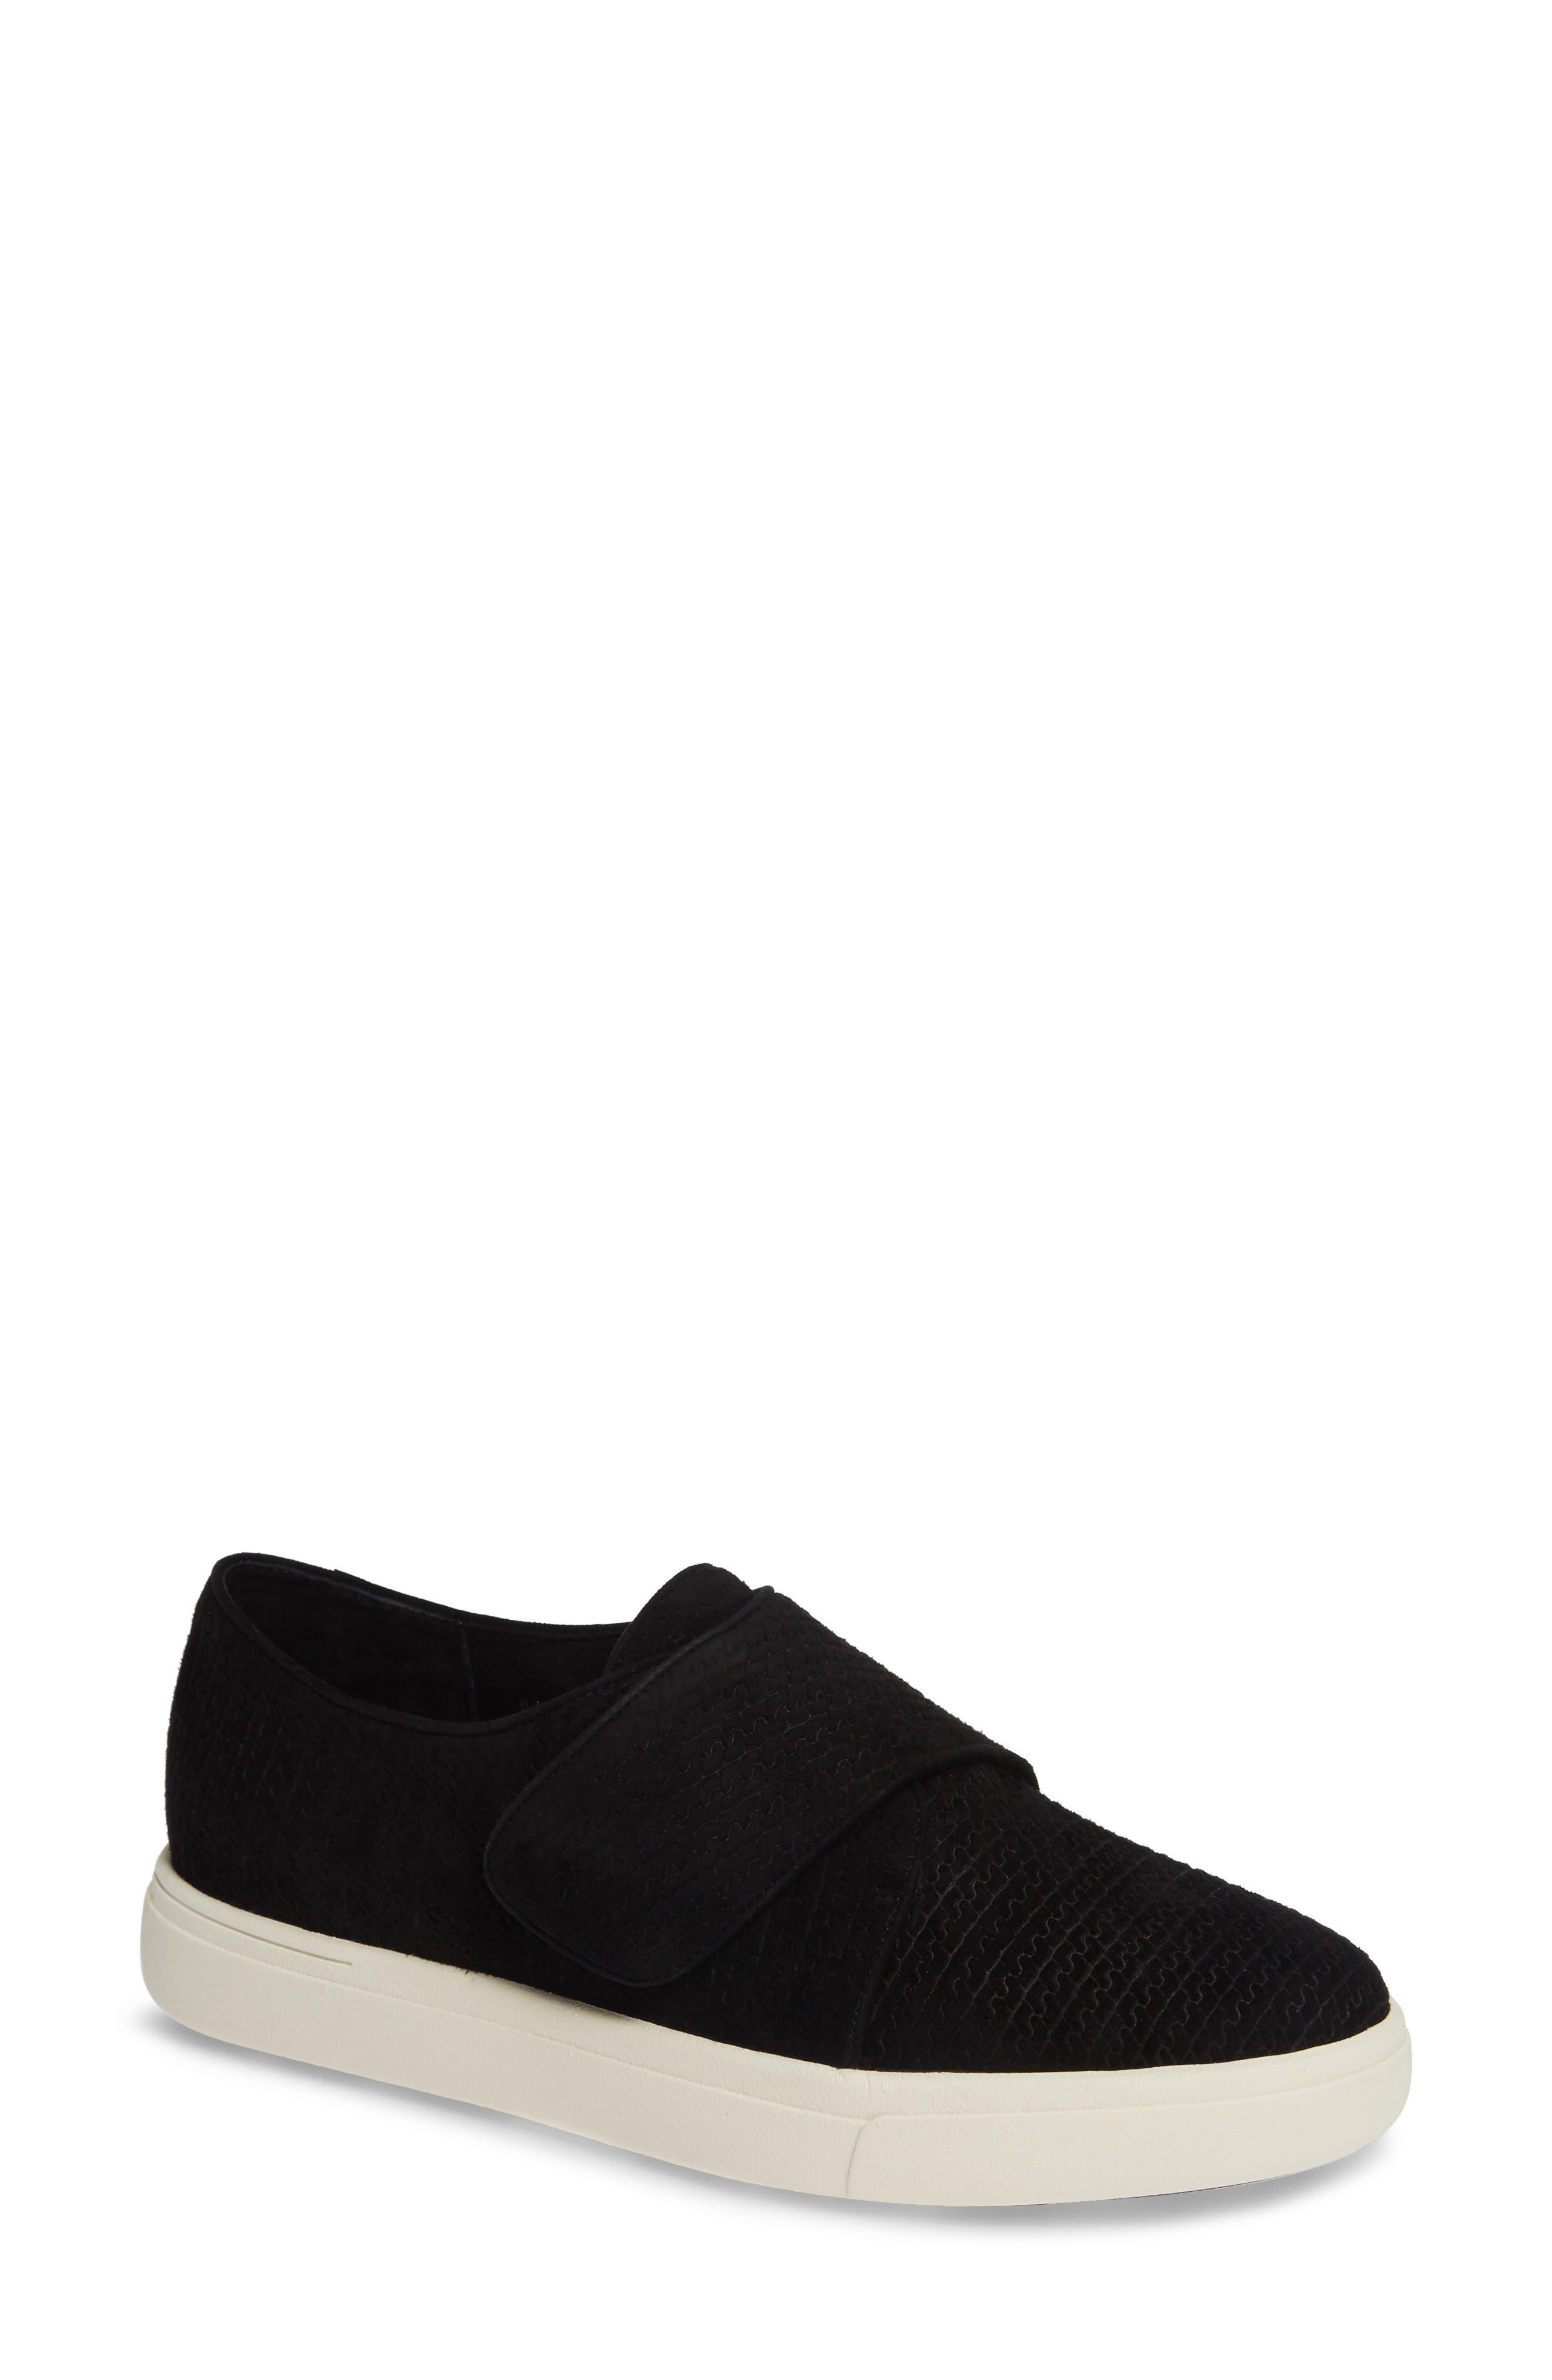 VANELI Oberon Slip-On Sneaker, Main, color, BLACK SUEDE